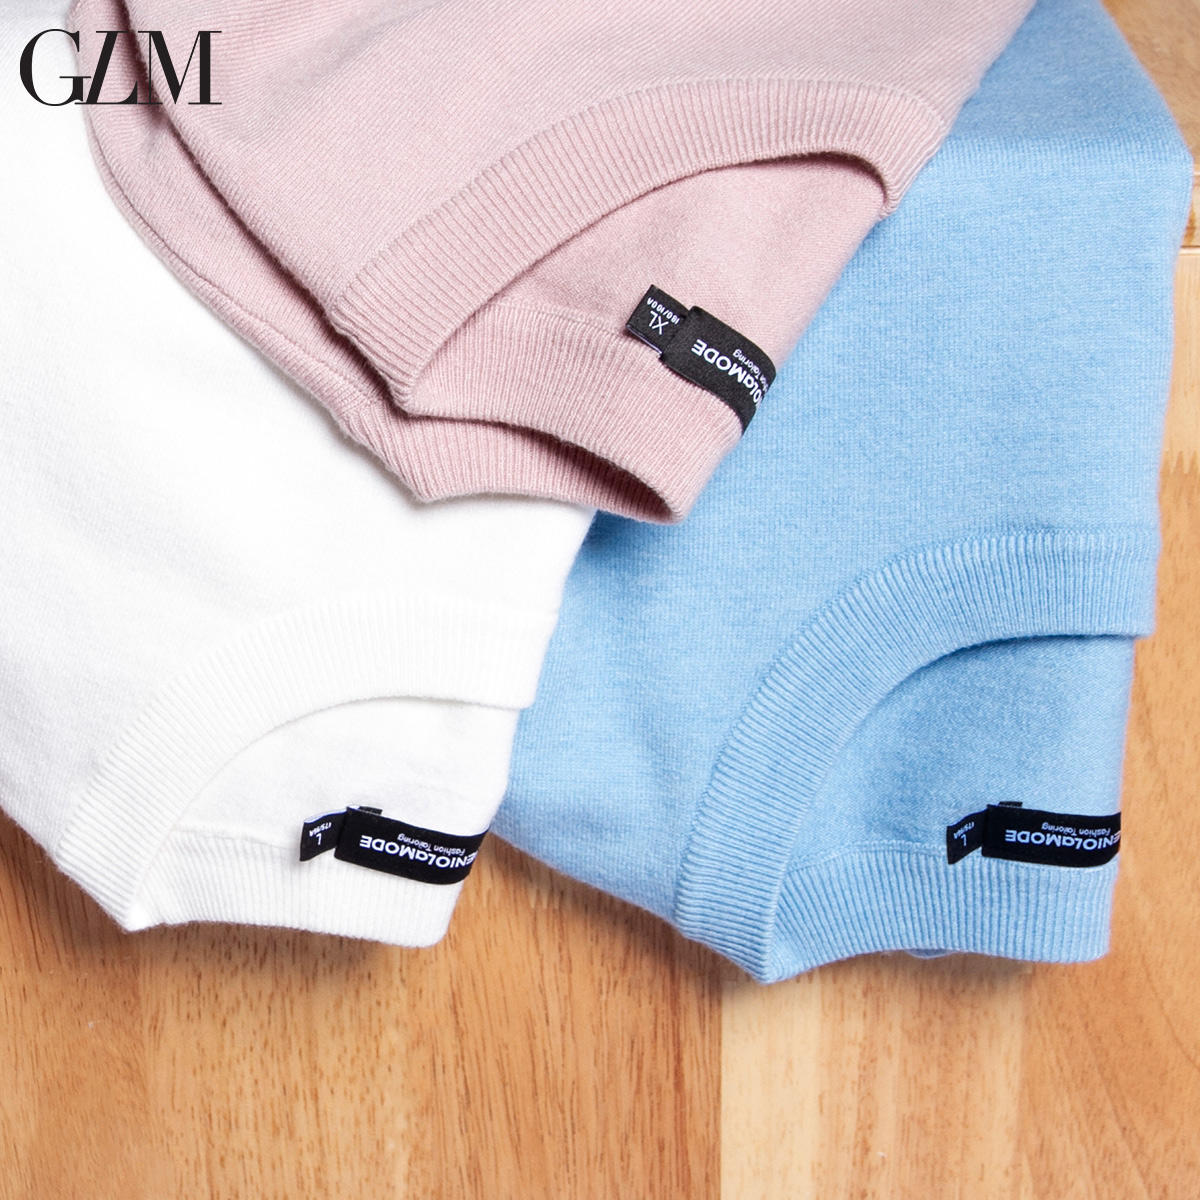 GLM男装2018冬季新款青年弹力罗纹套头衫纯色简约毛衫